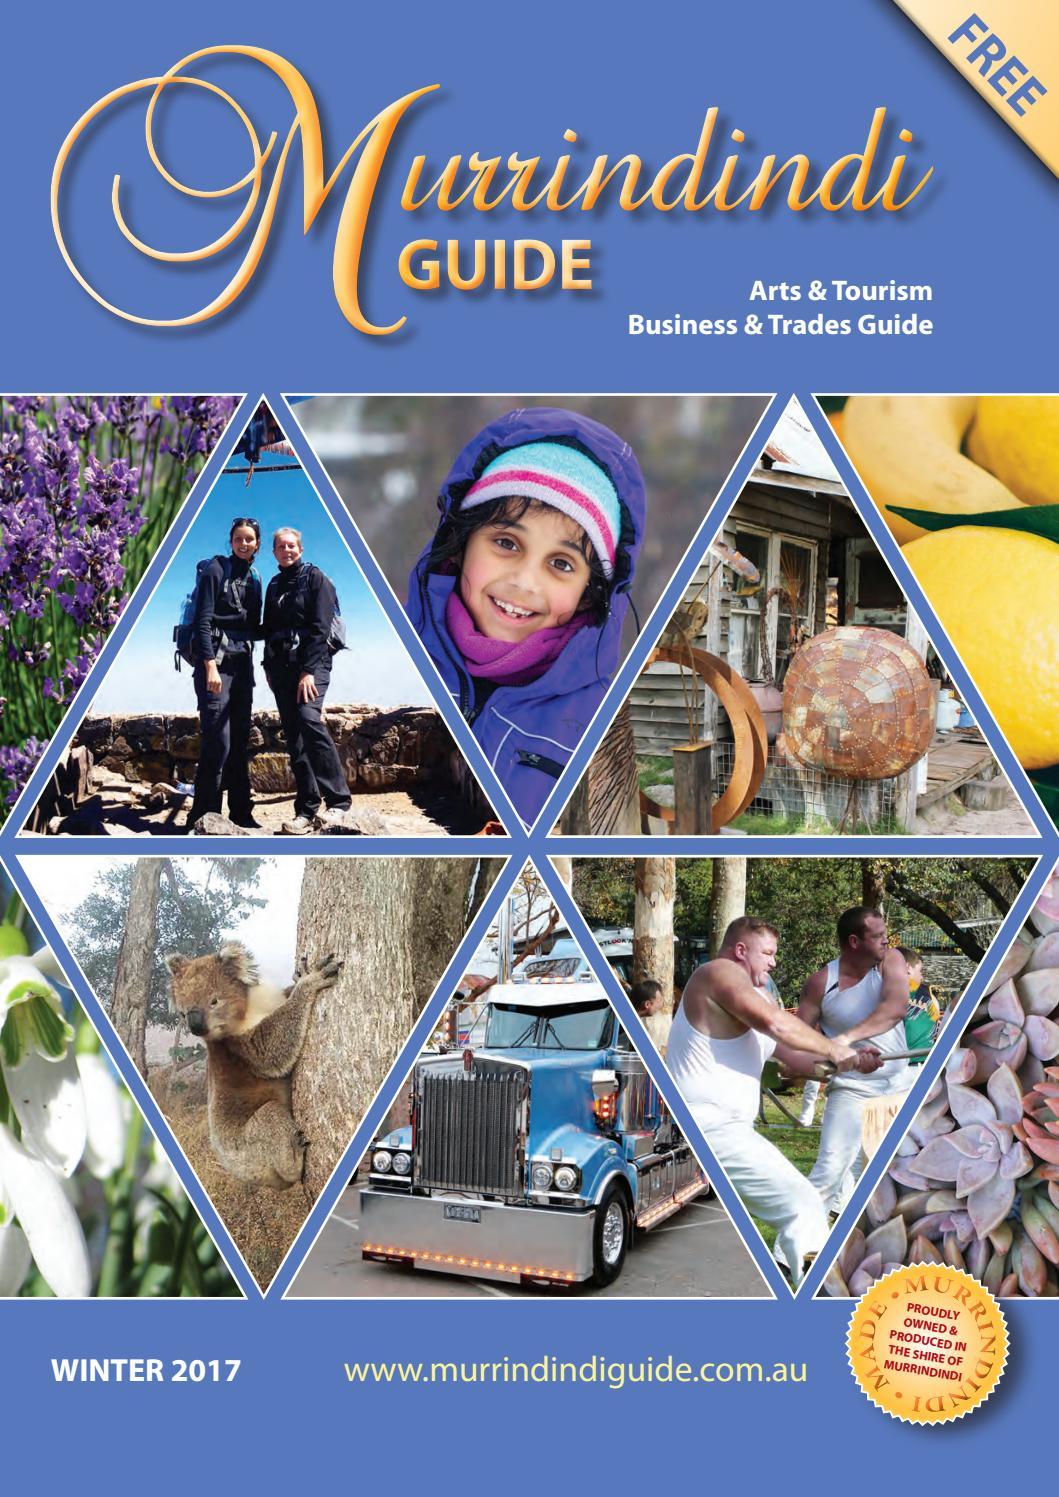 By Murrindindi Guide Issuu Ann Friedel 2017 Winter bf76yg